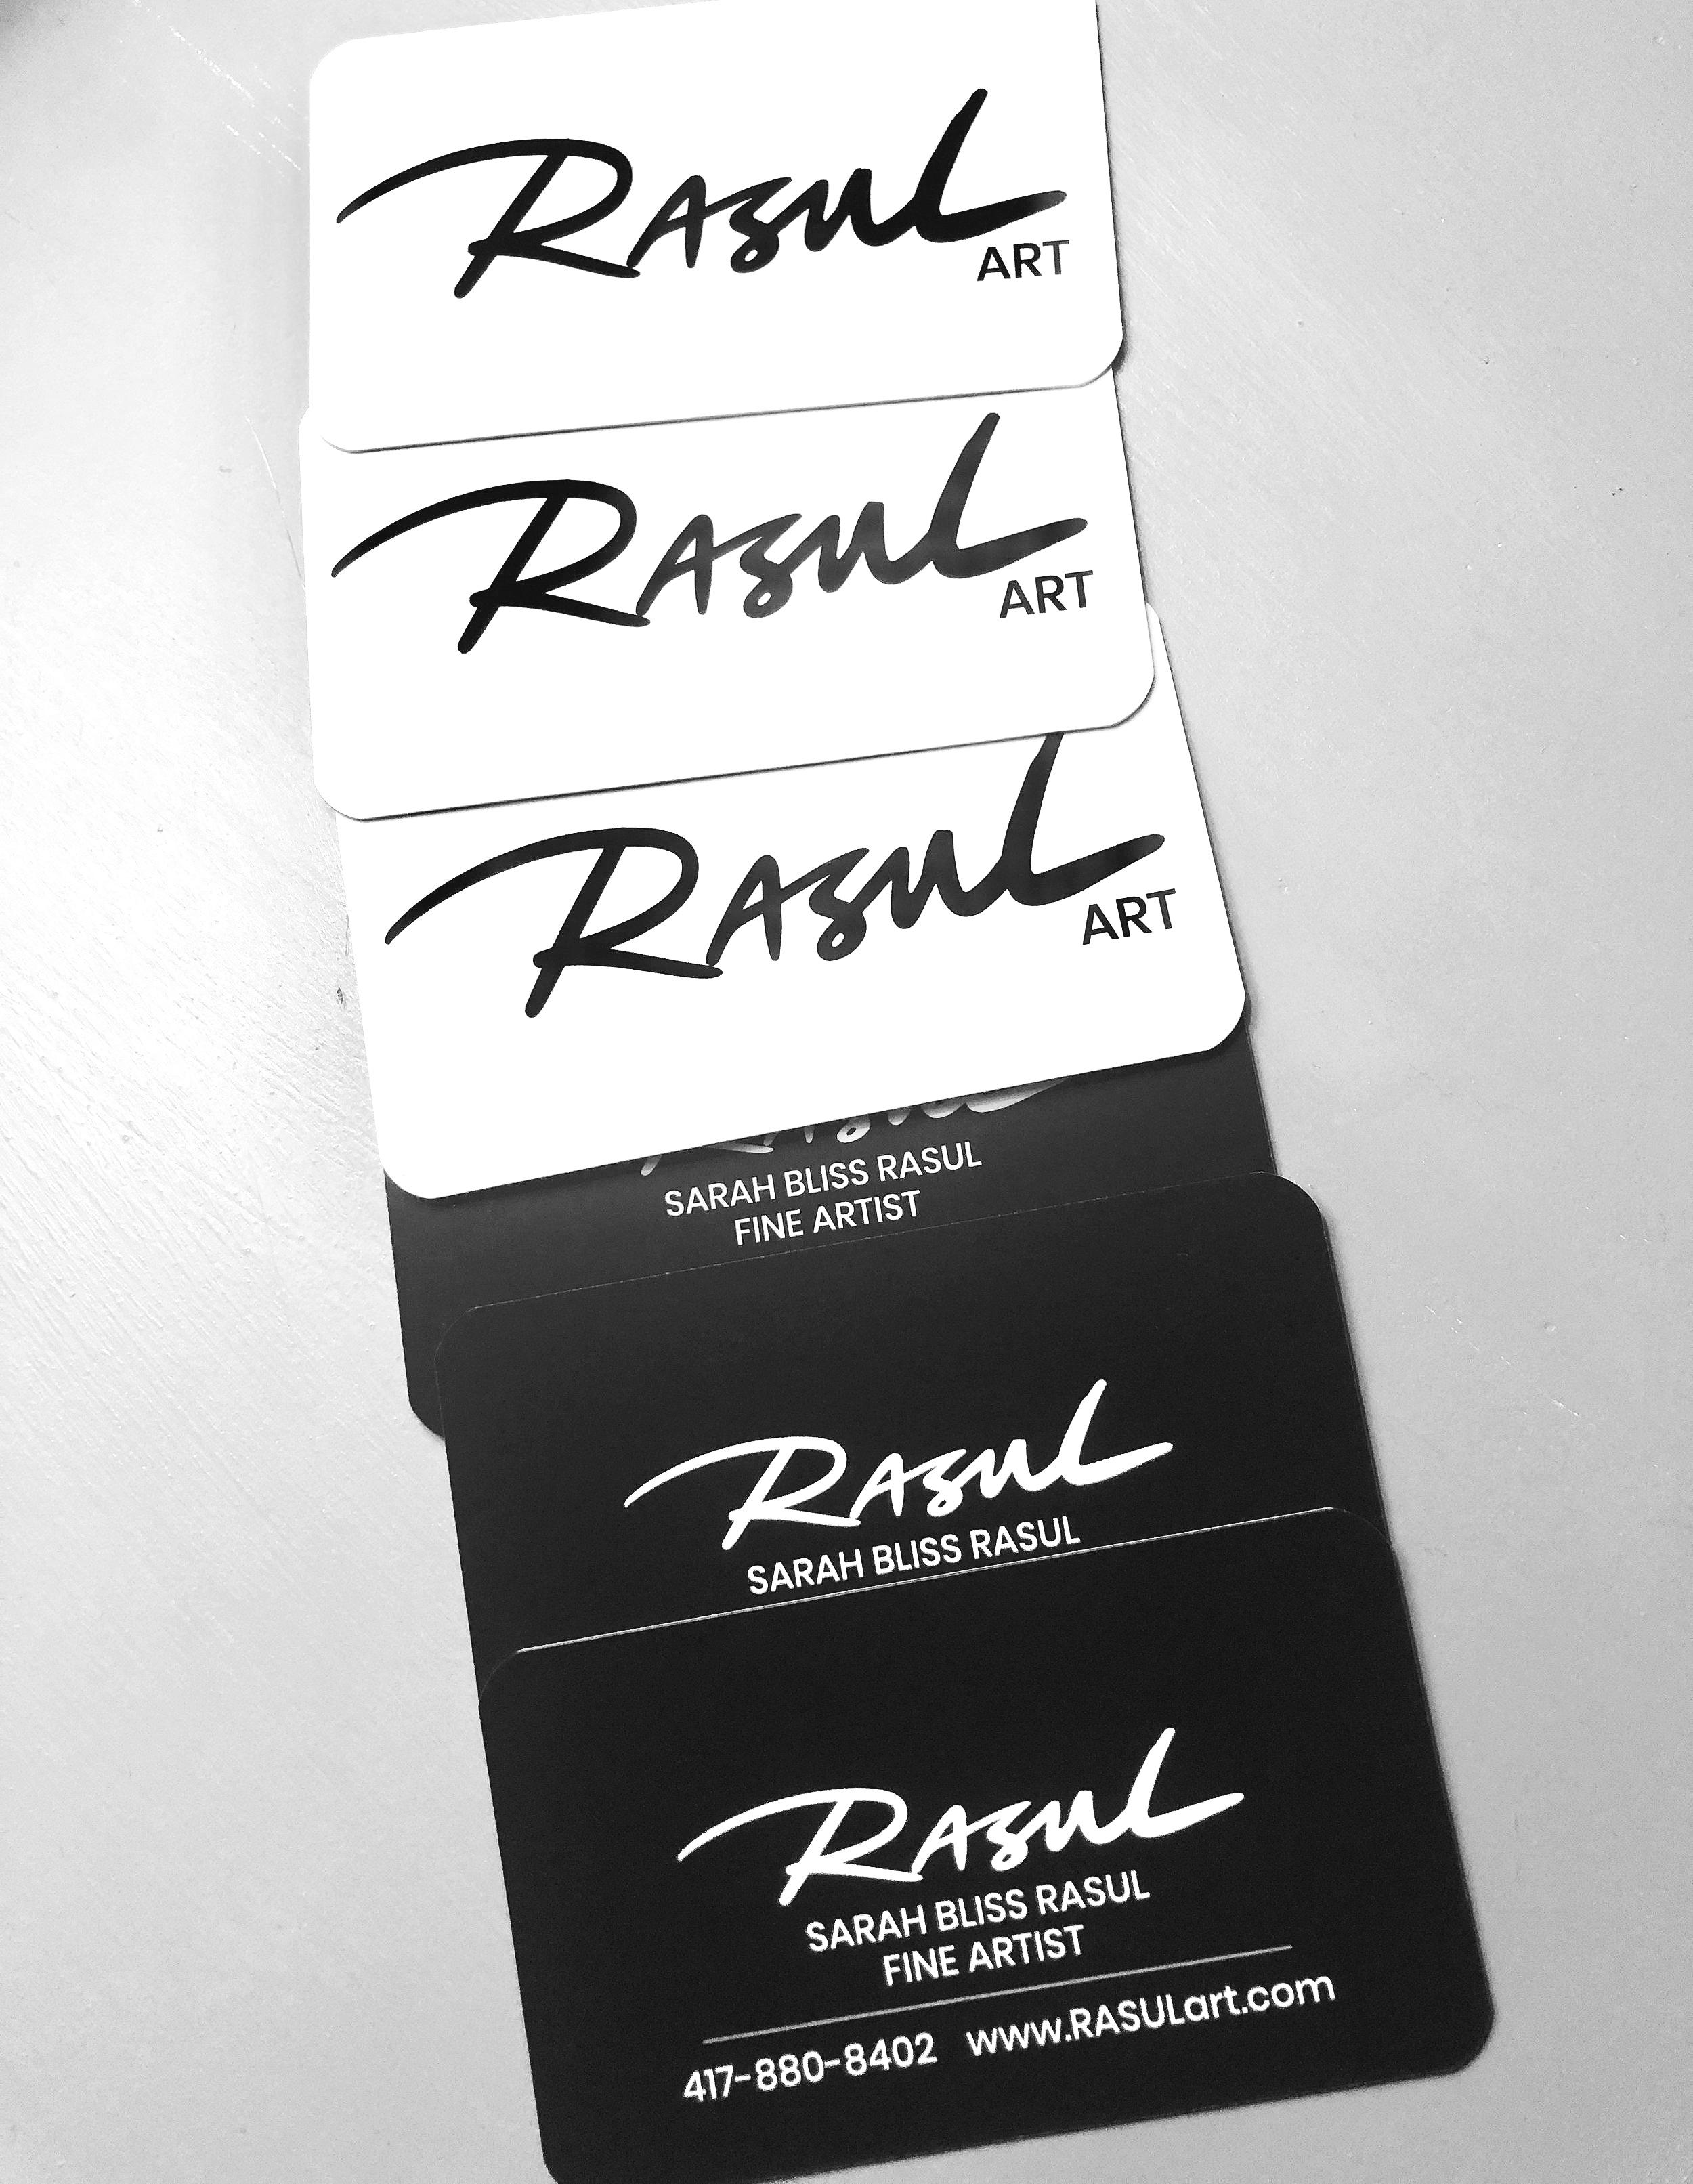 RASULart Business Cards